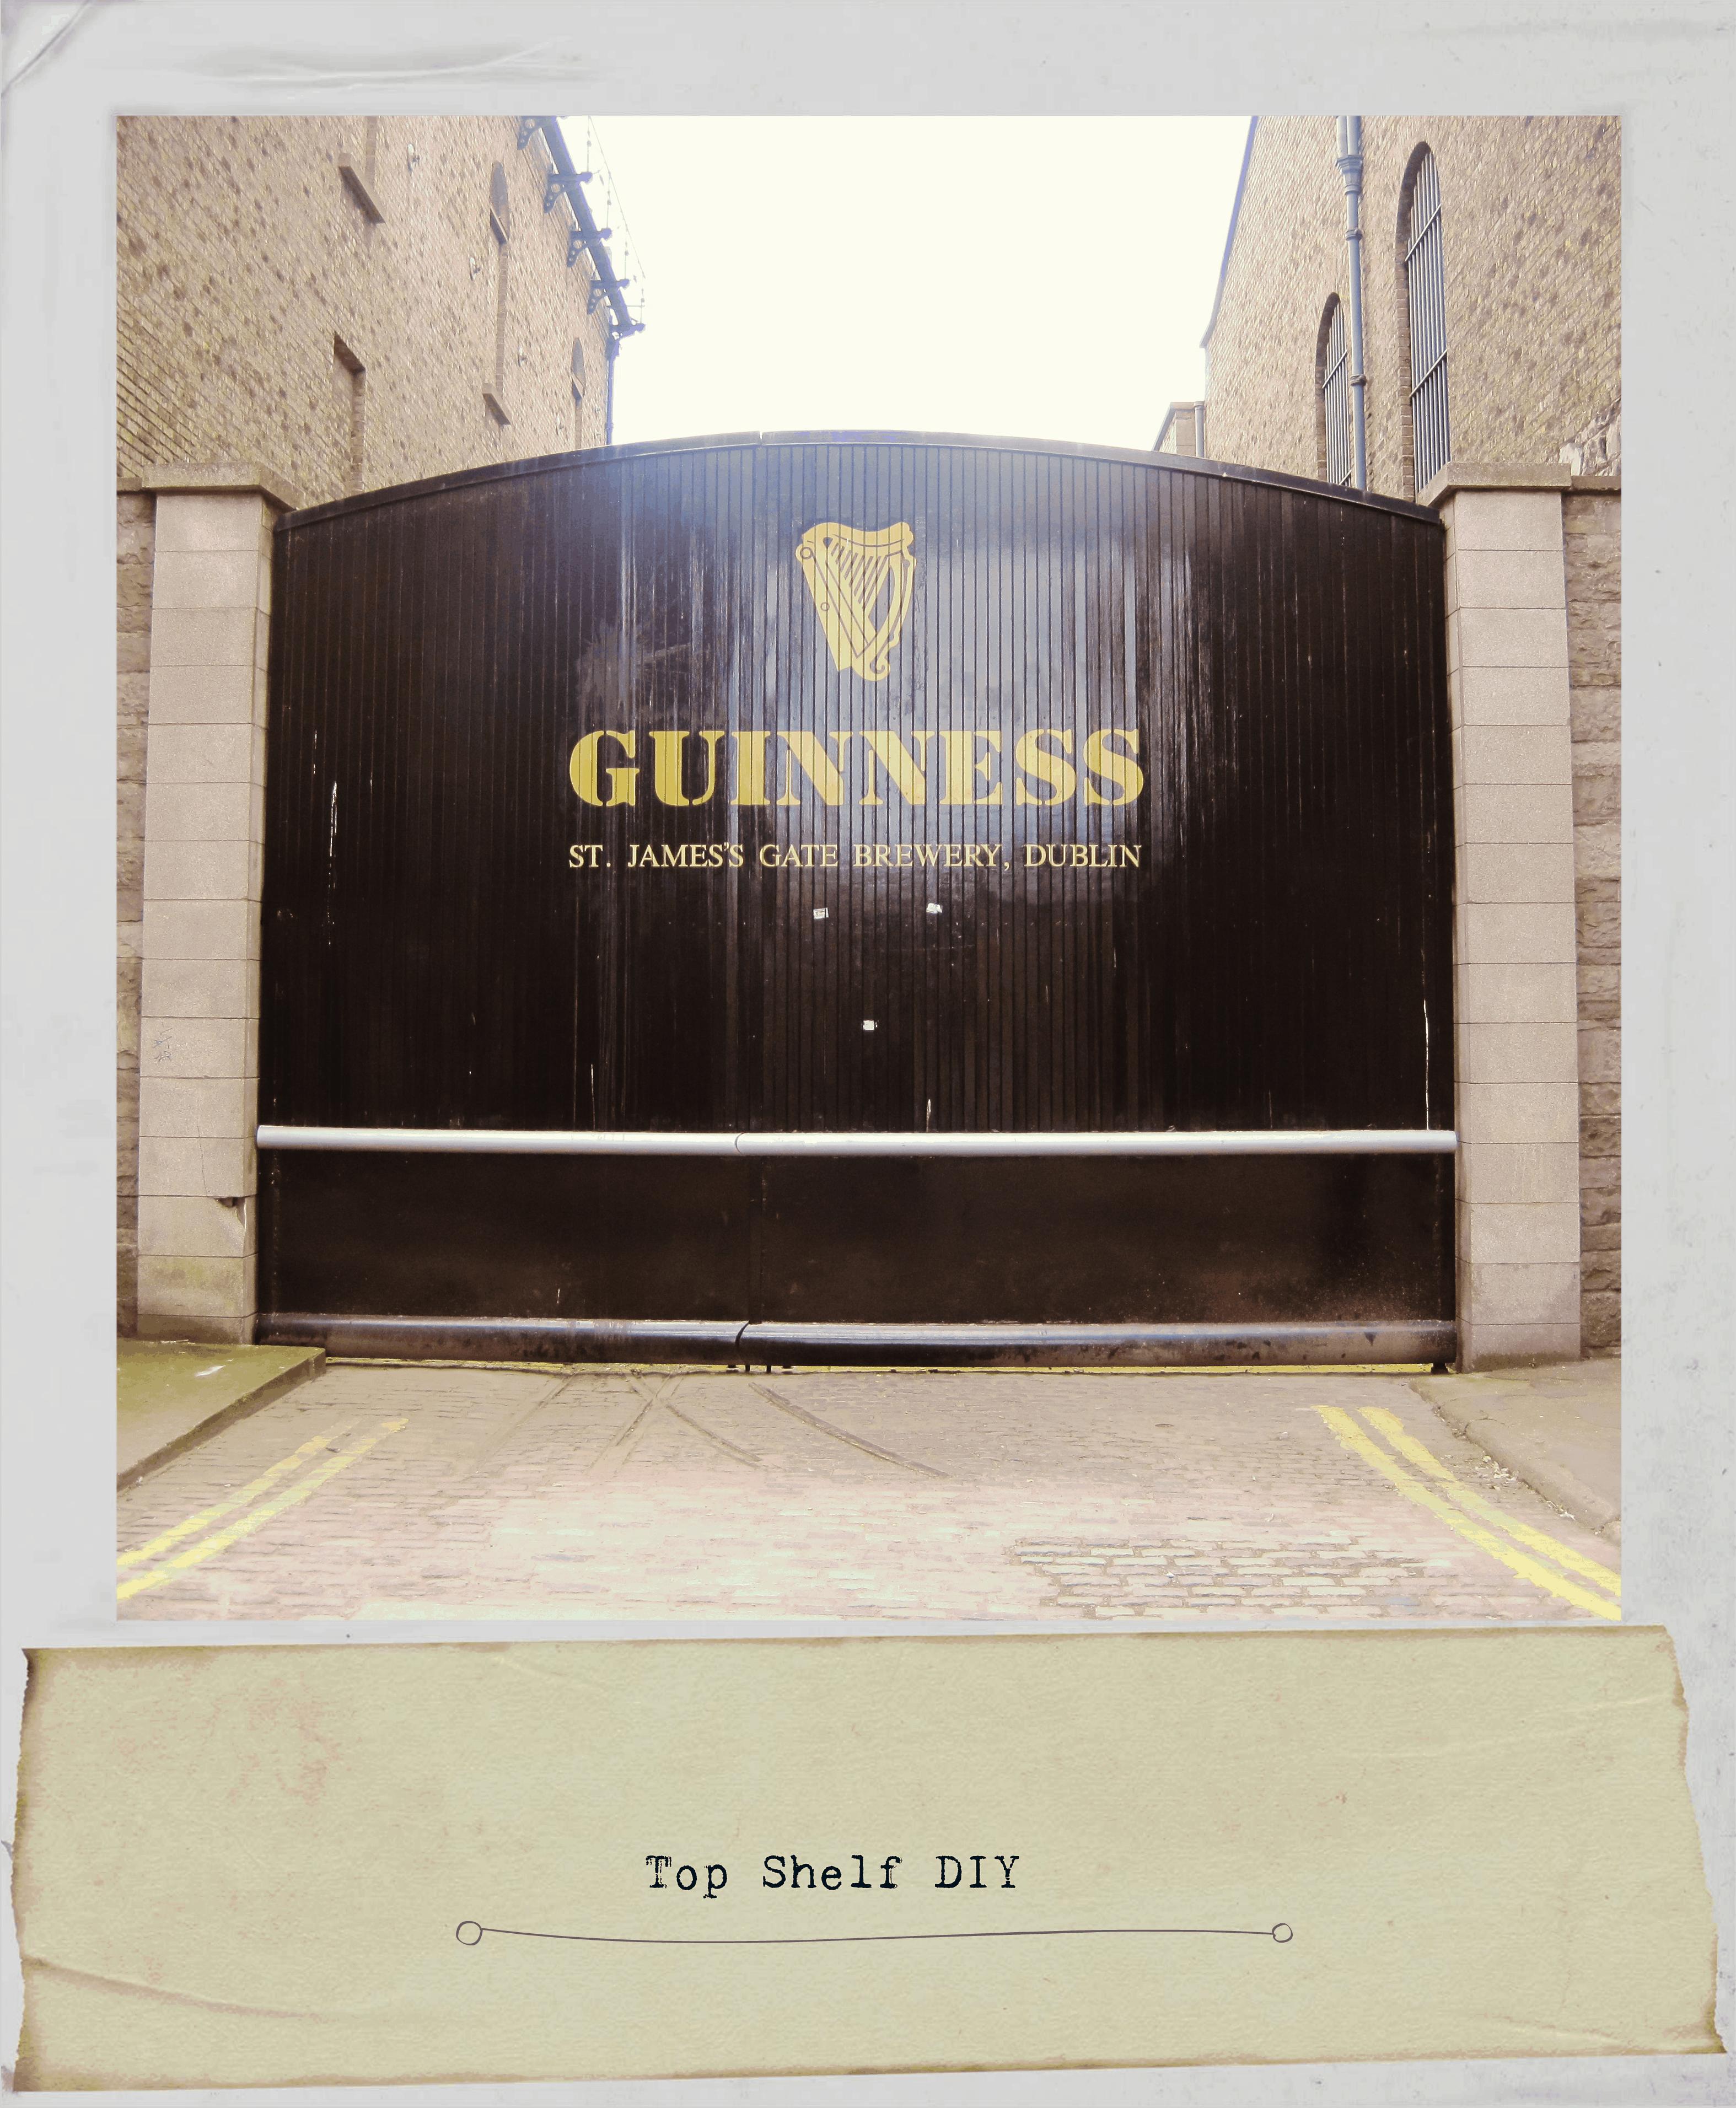 St. James Gate at Guinness Factory in Dublin